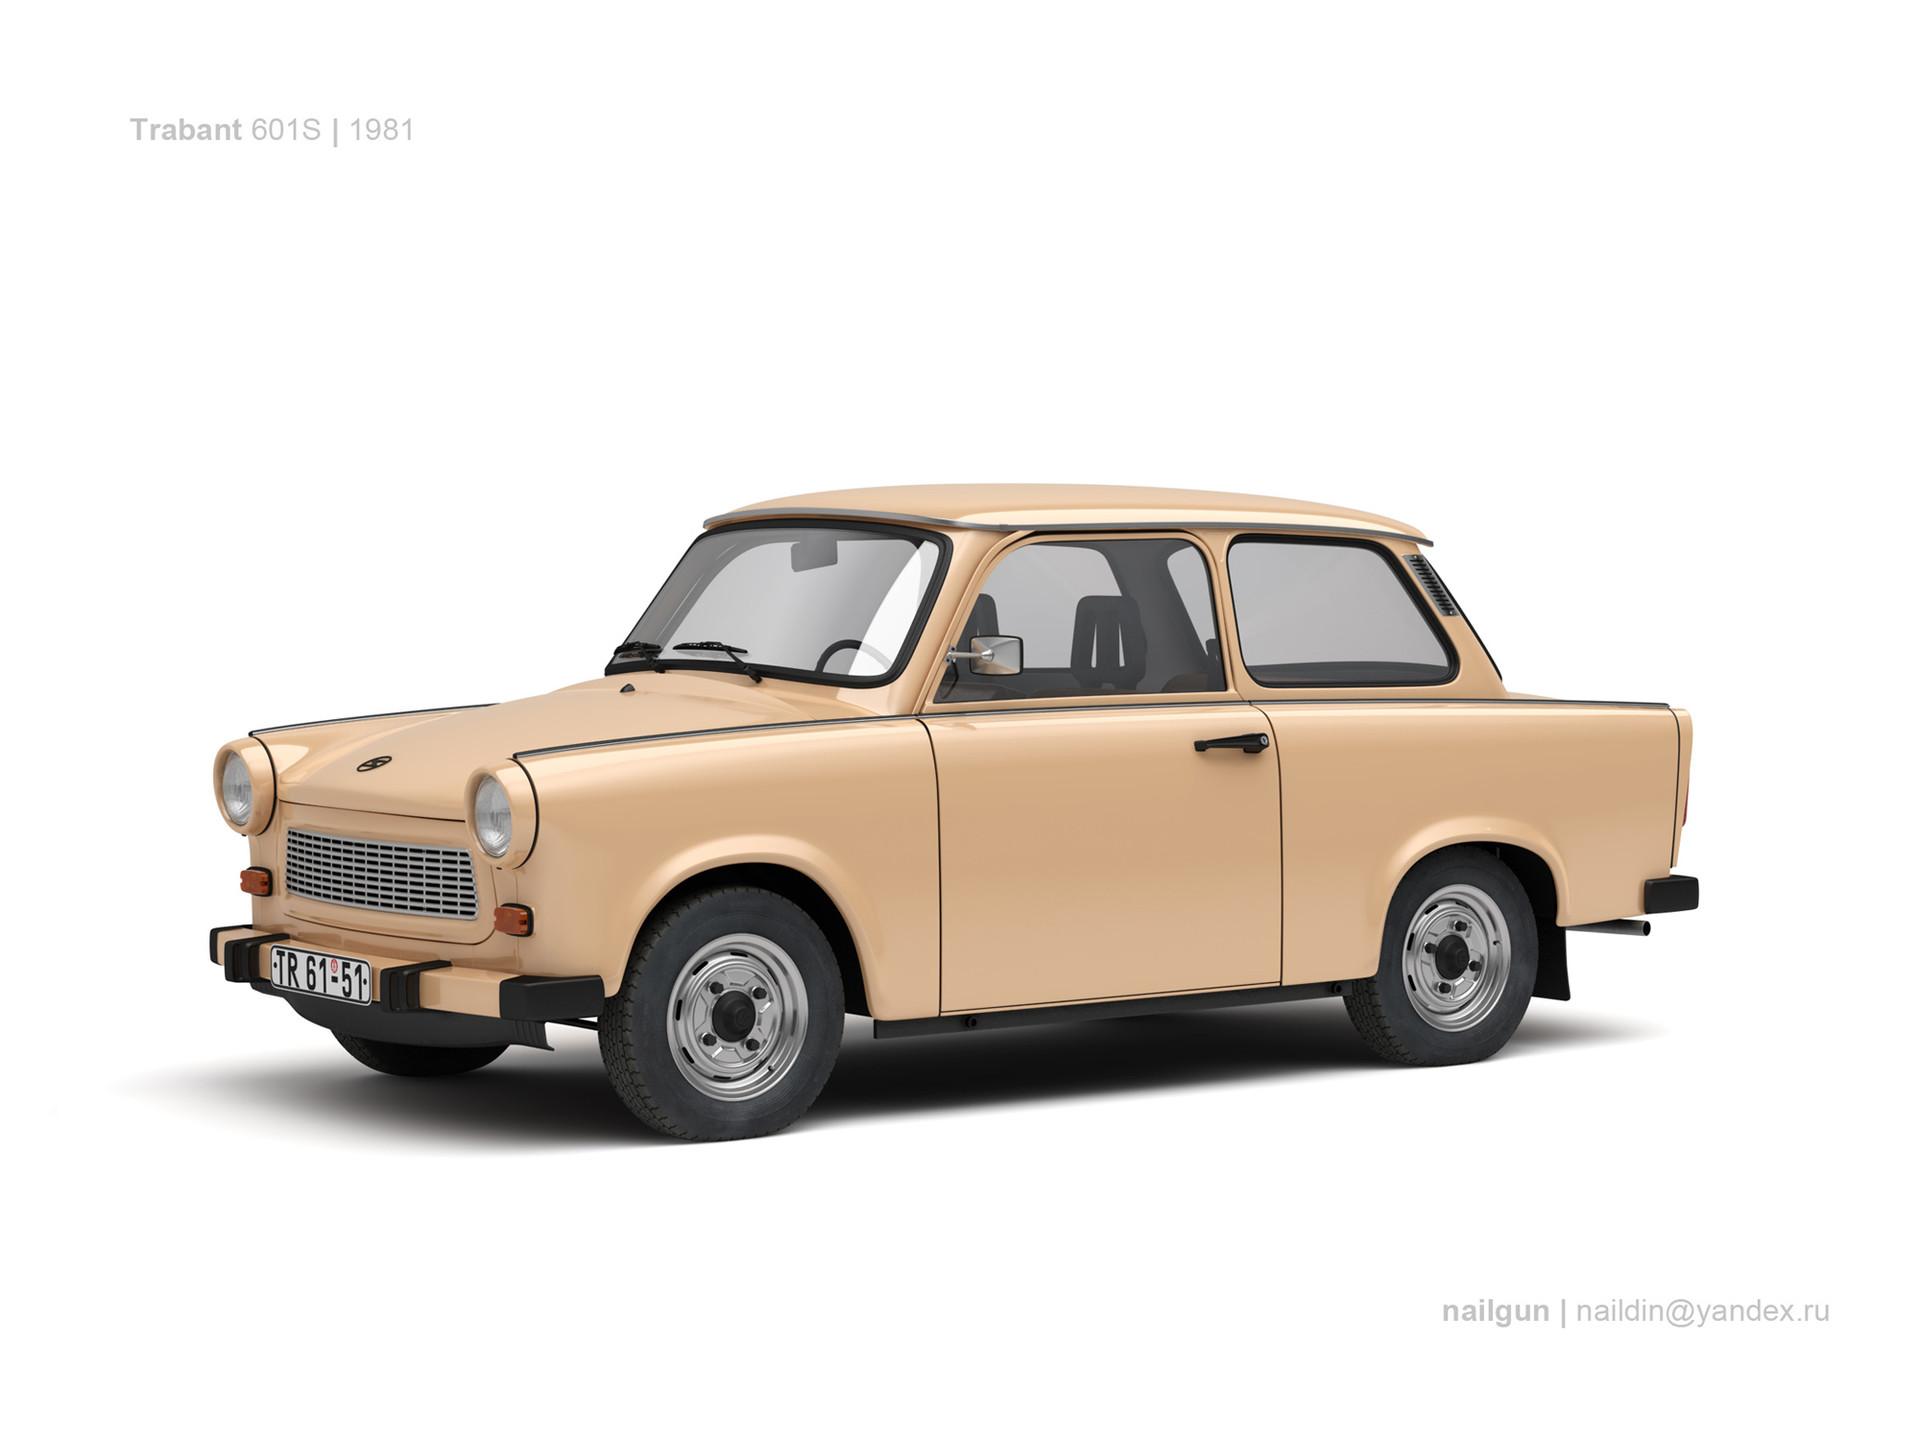 Nail khusnutdinov germany trabant 601s limousine 0